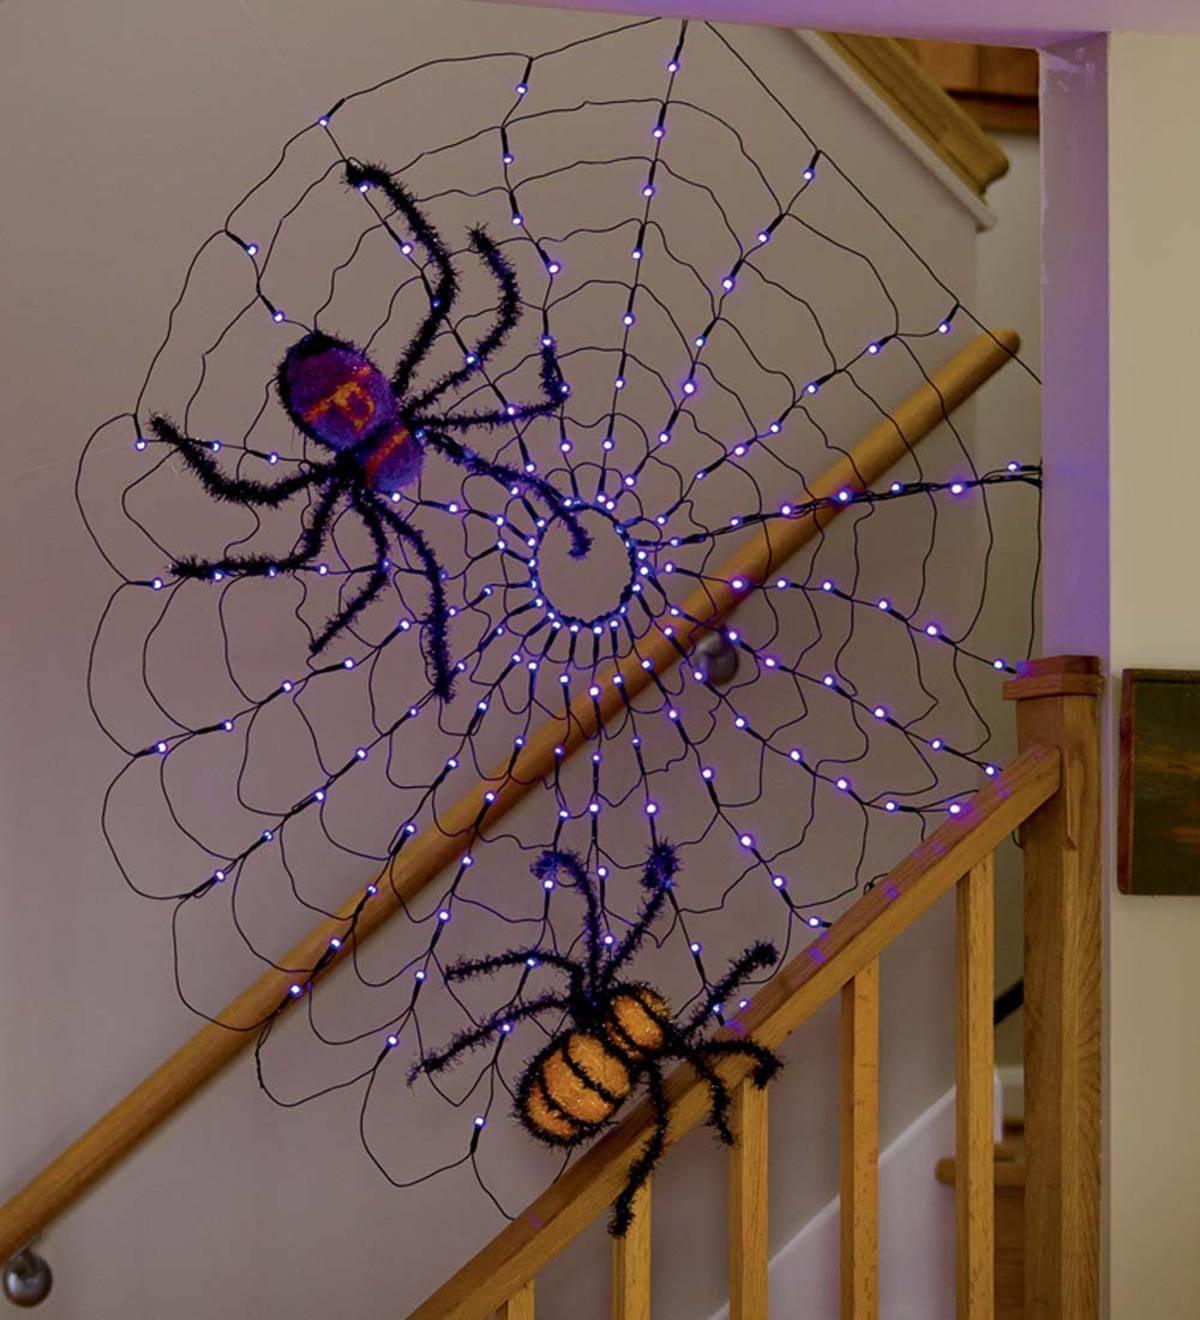 Lighted Spiderweb Decoration